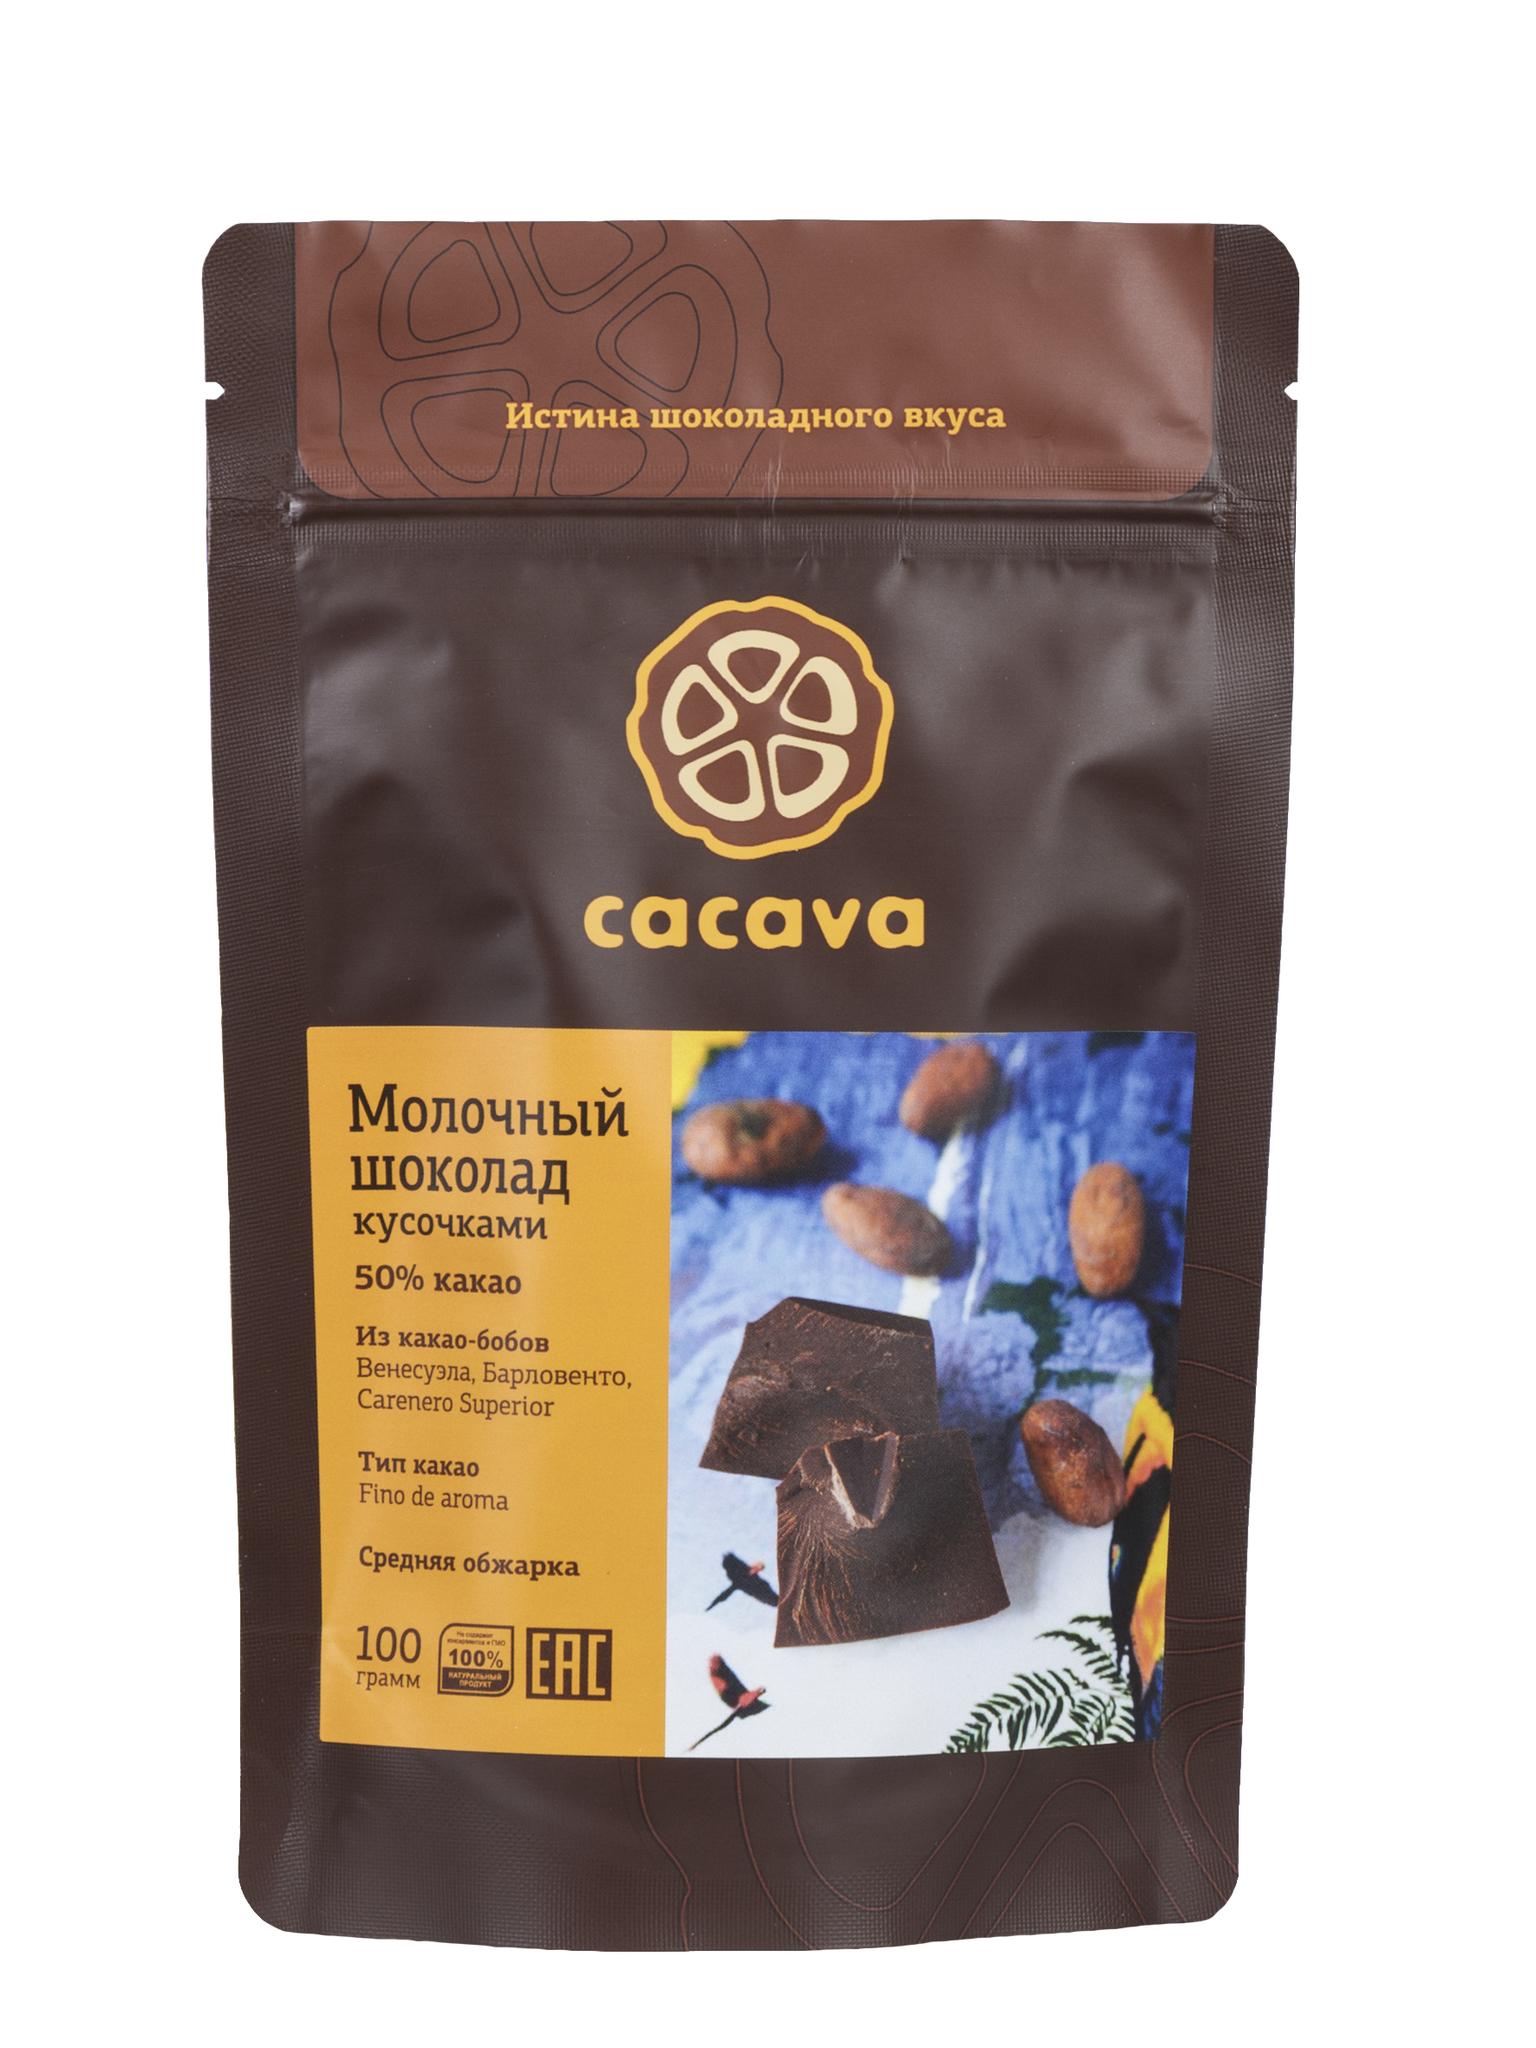 Молочный шоколад 50 % какао (Венесуэла), упаковка 100 грамм